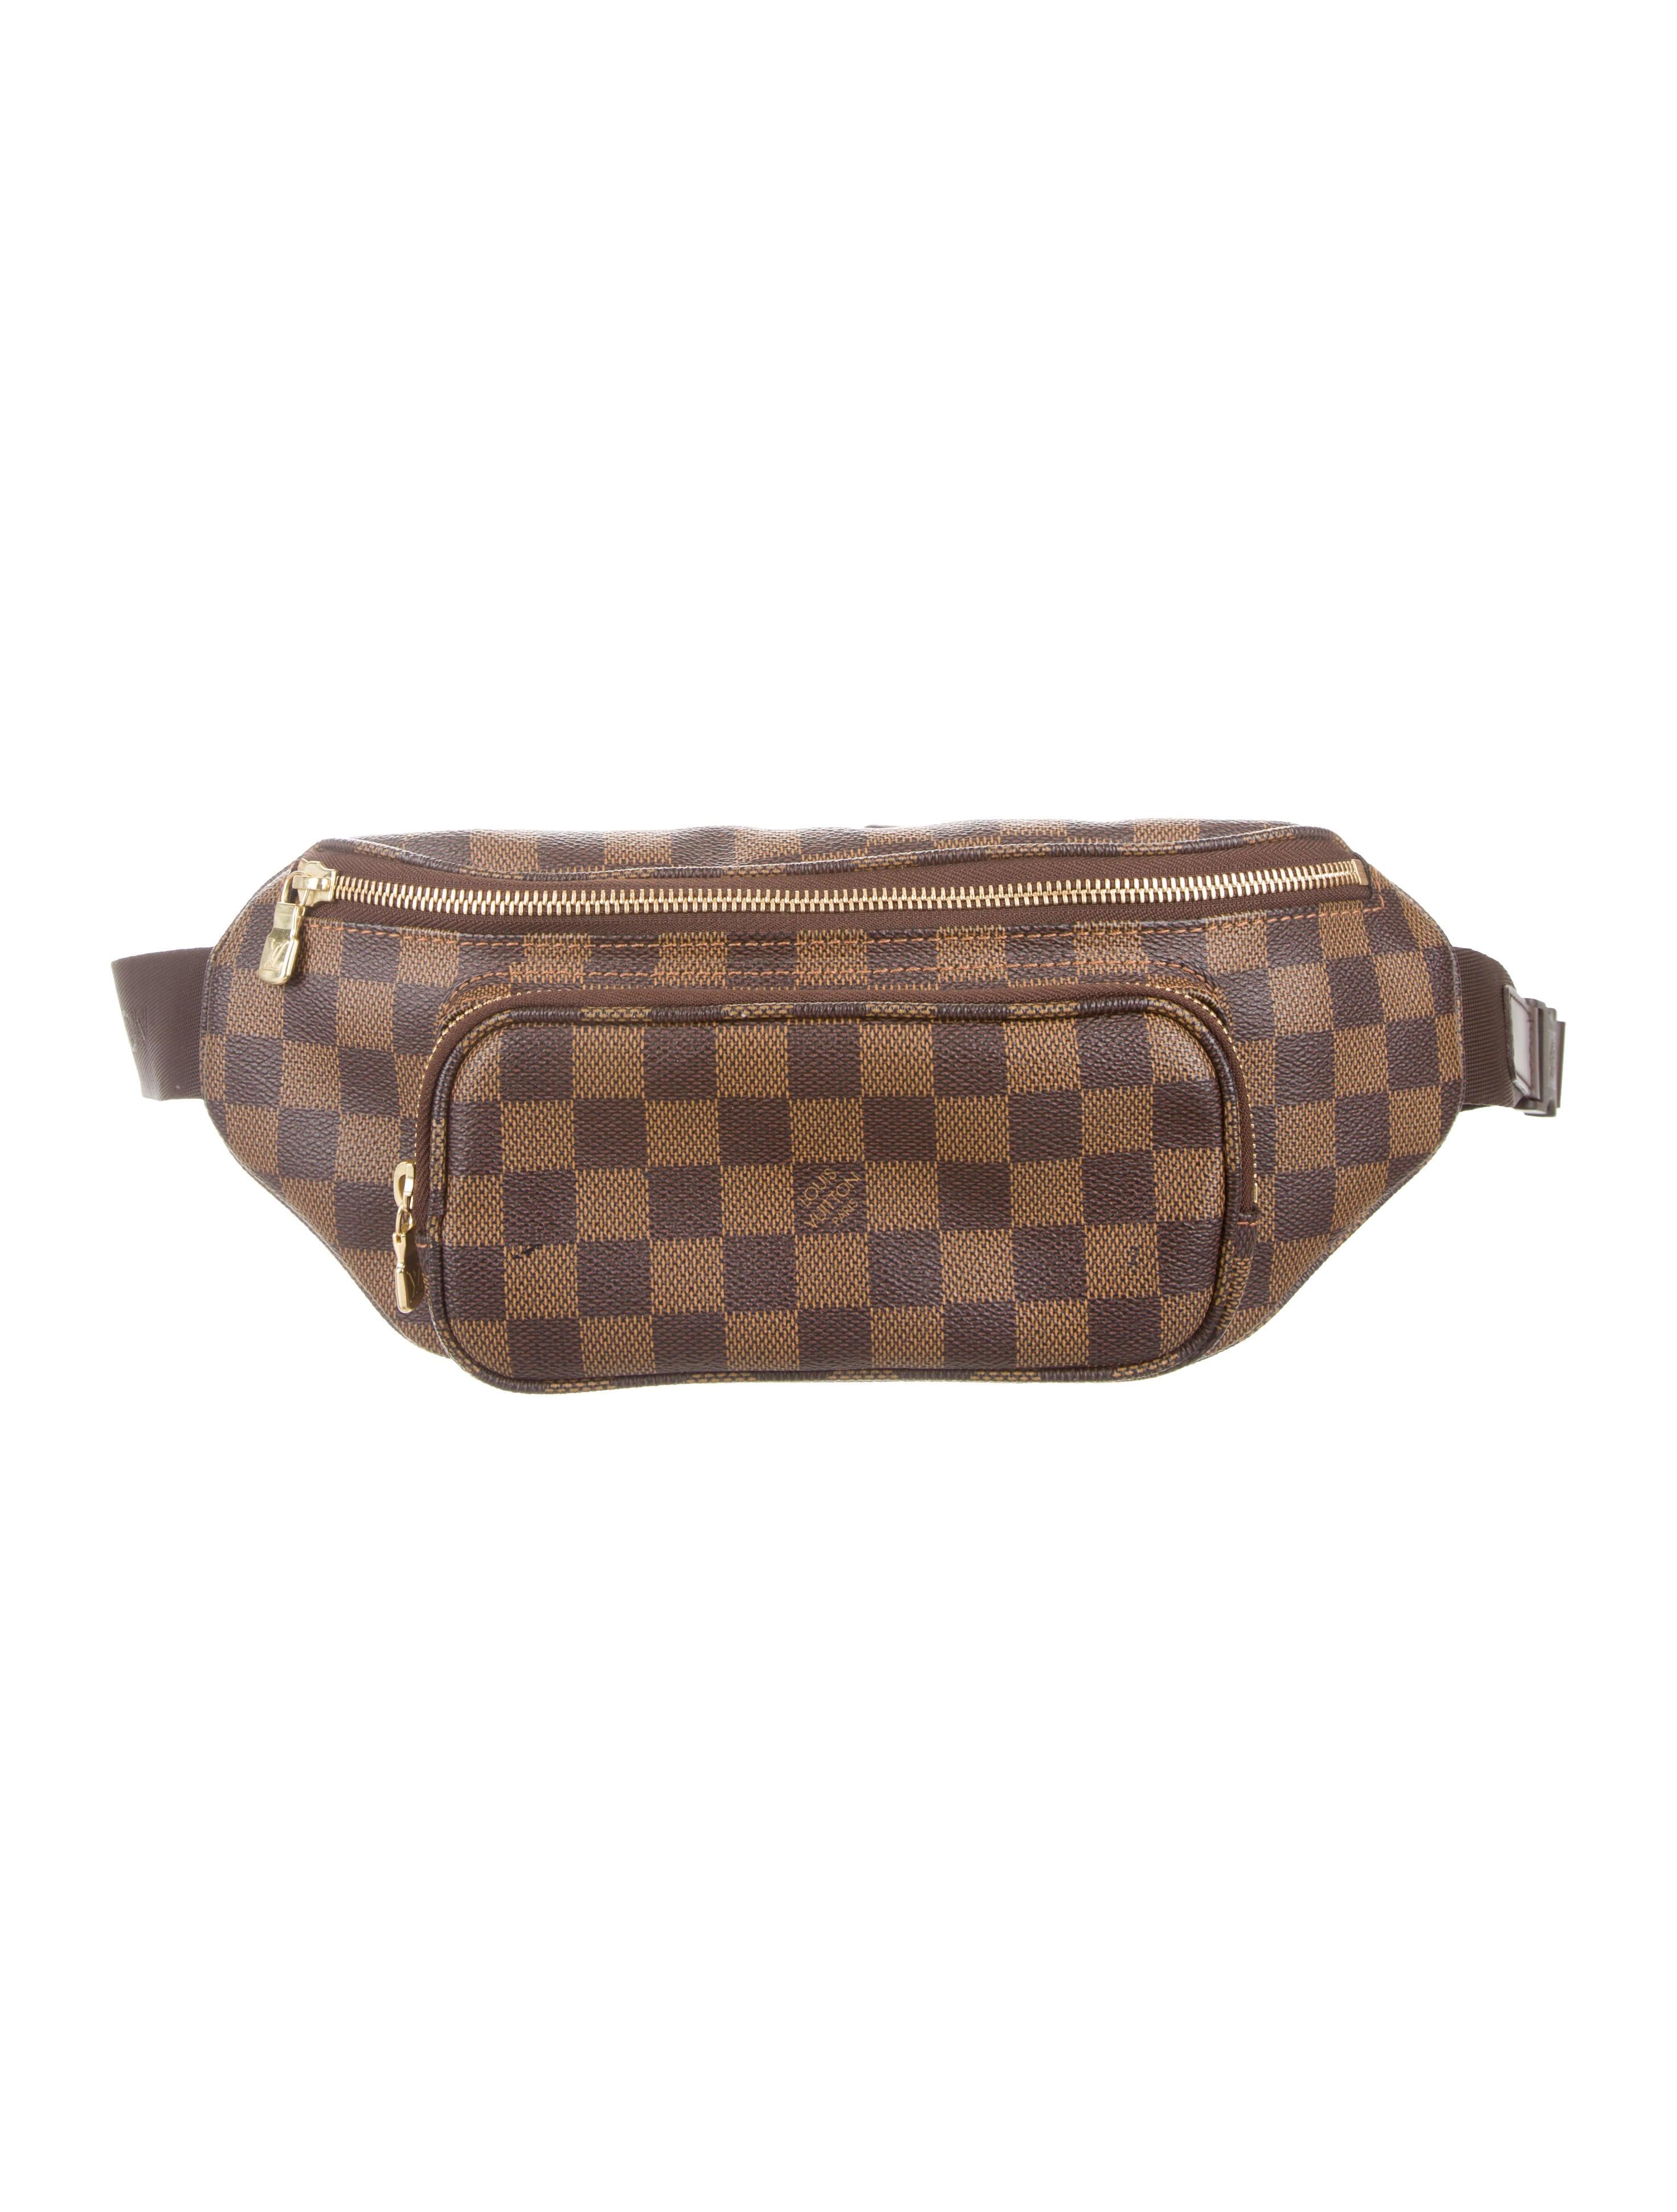 b126ef4288c6 Louis Vuitton Damier Ebene Melville Waist Bag - Bags - LOU63942 ...